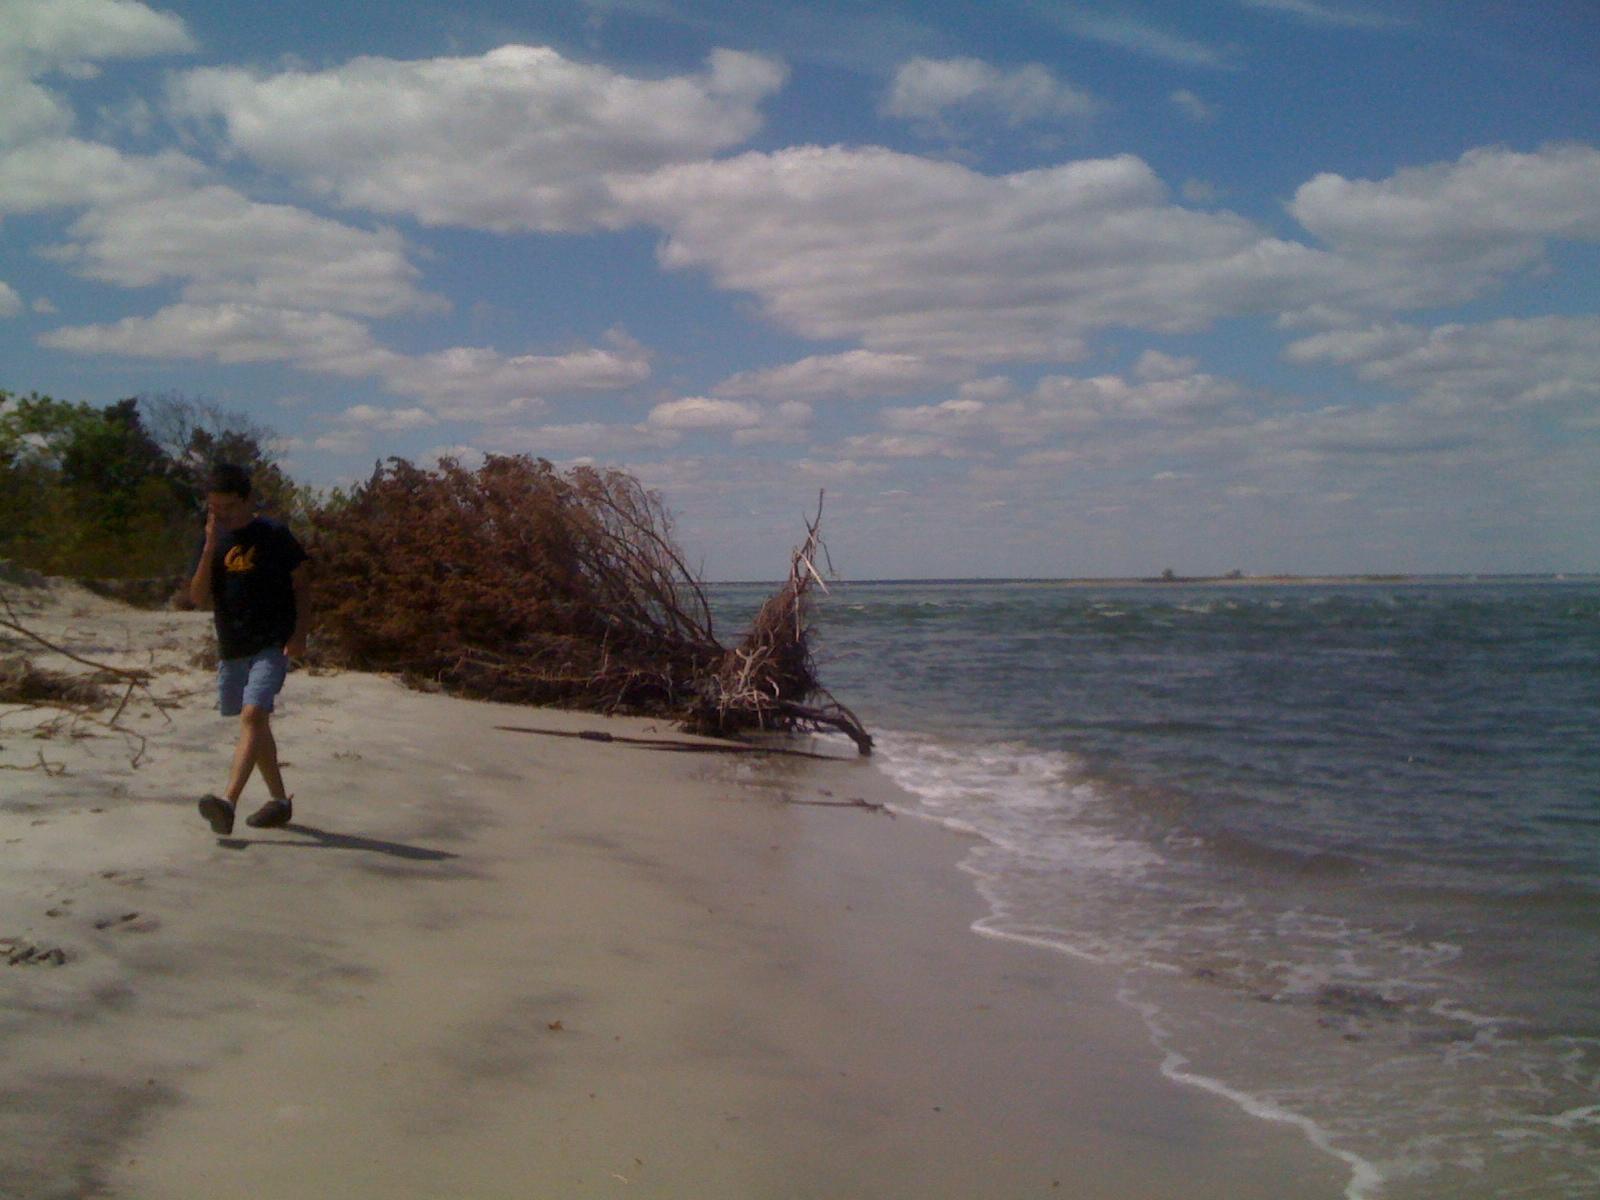 Charlie walking on the beach on Sunday